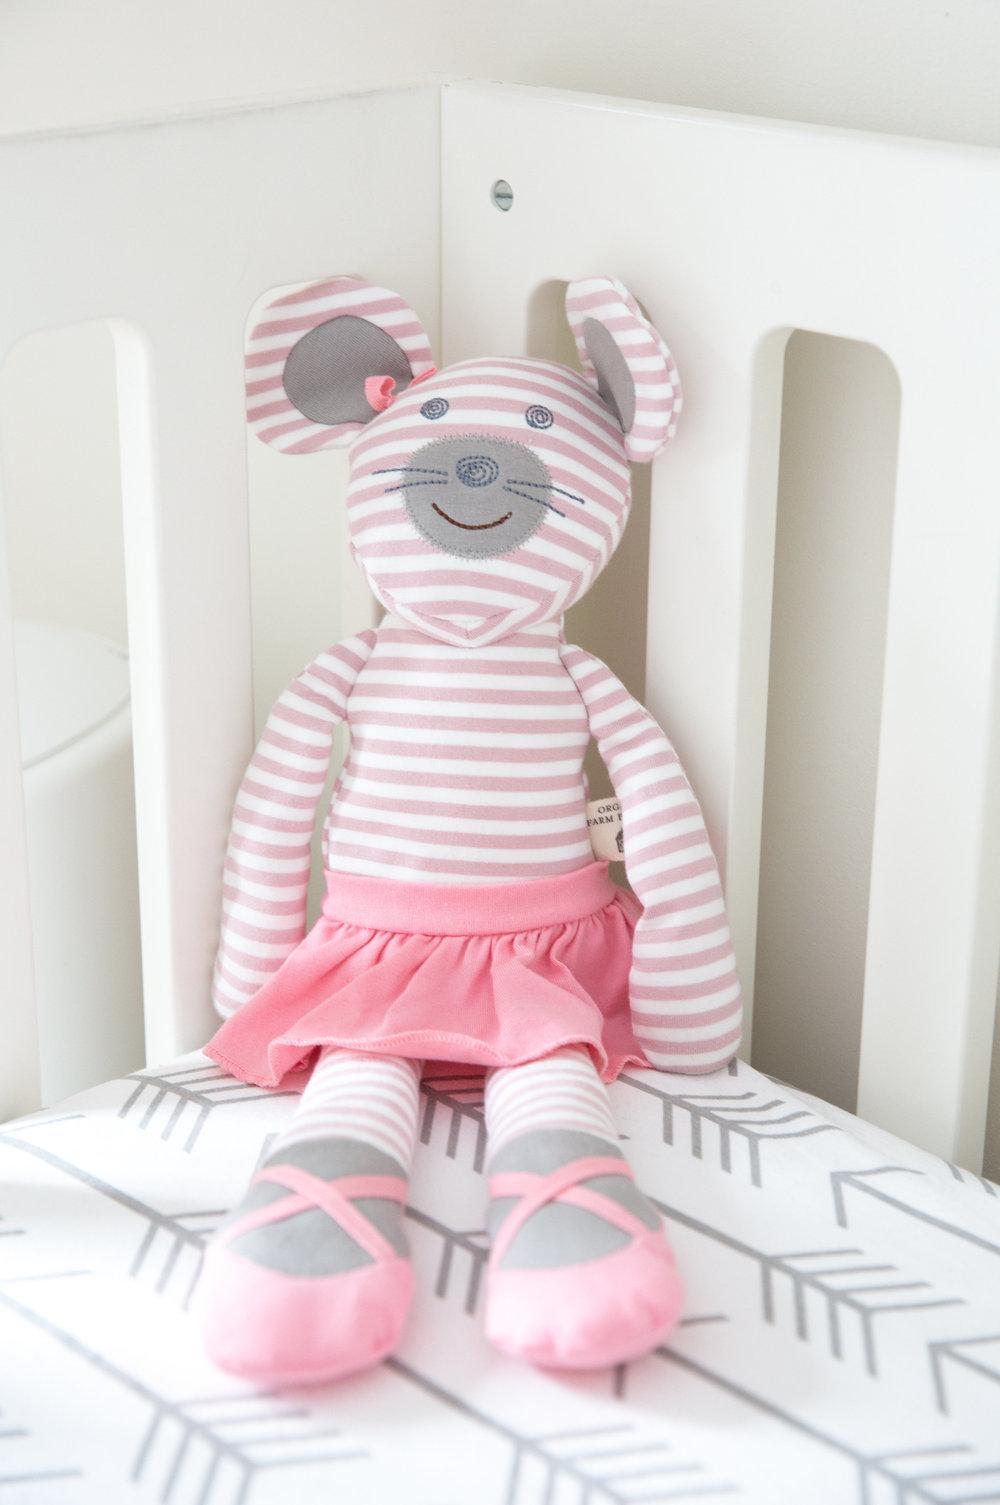 Ceci_Johnson_Welcome_Baby_Elle_Hazel_Johnson_Nursery_Tour_Design_Baby_Product_Pick_kid_Ana_Schechter_newborn_photography_13.jpg